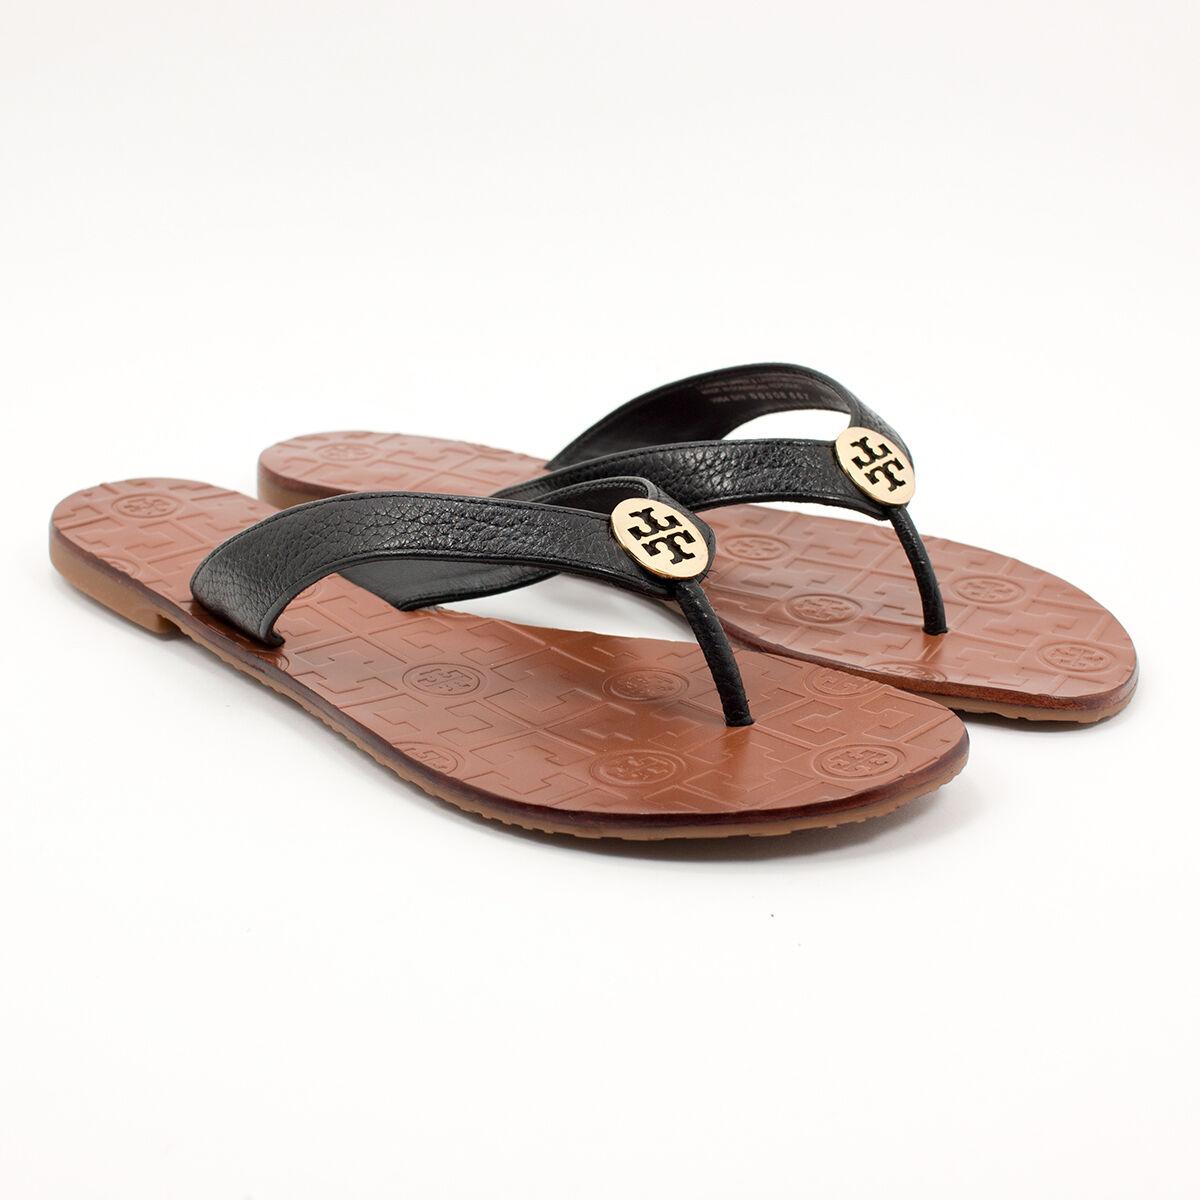 91b4db784 Tory Burch Thora Black Tumbled Leather Thong Sandal With Gold Logo ...